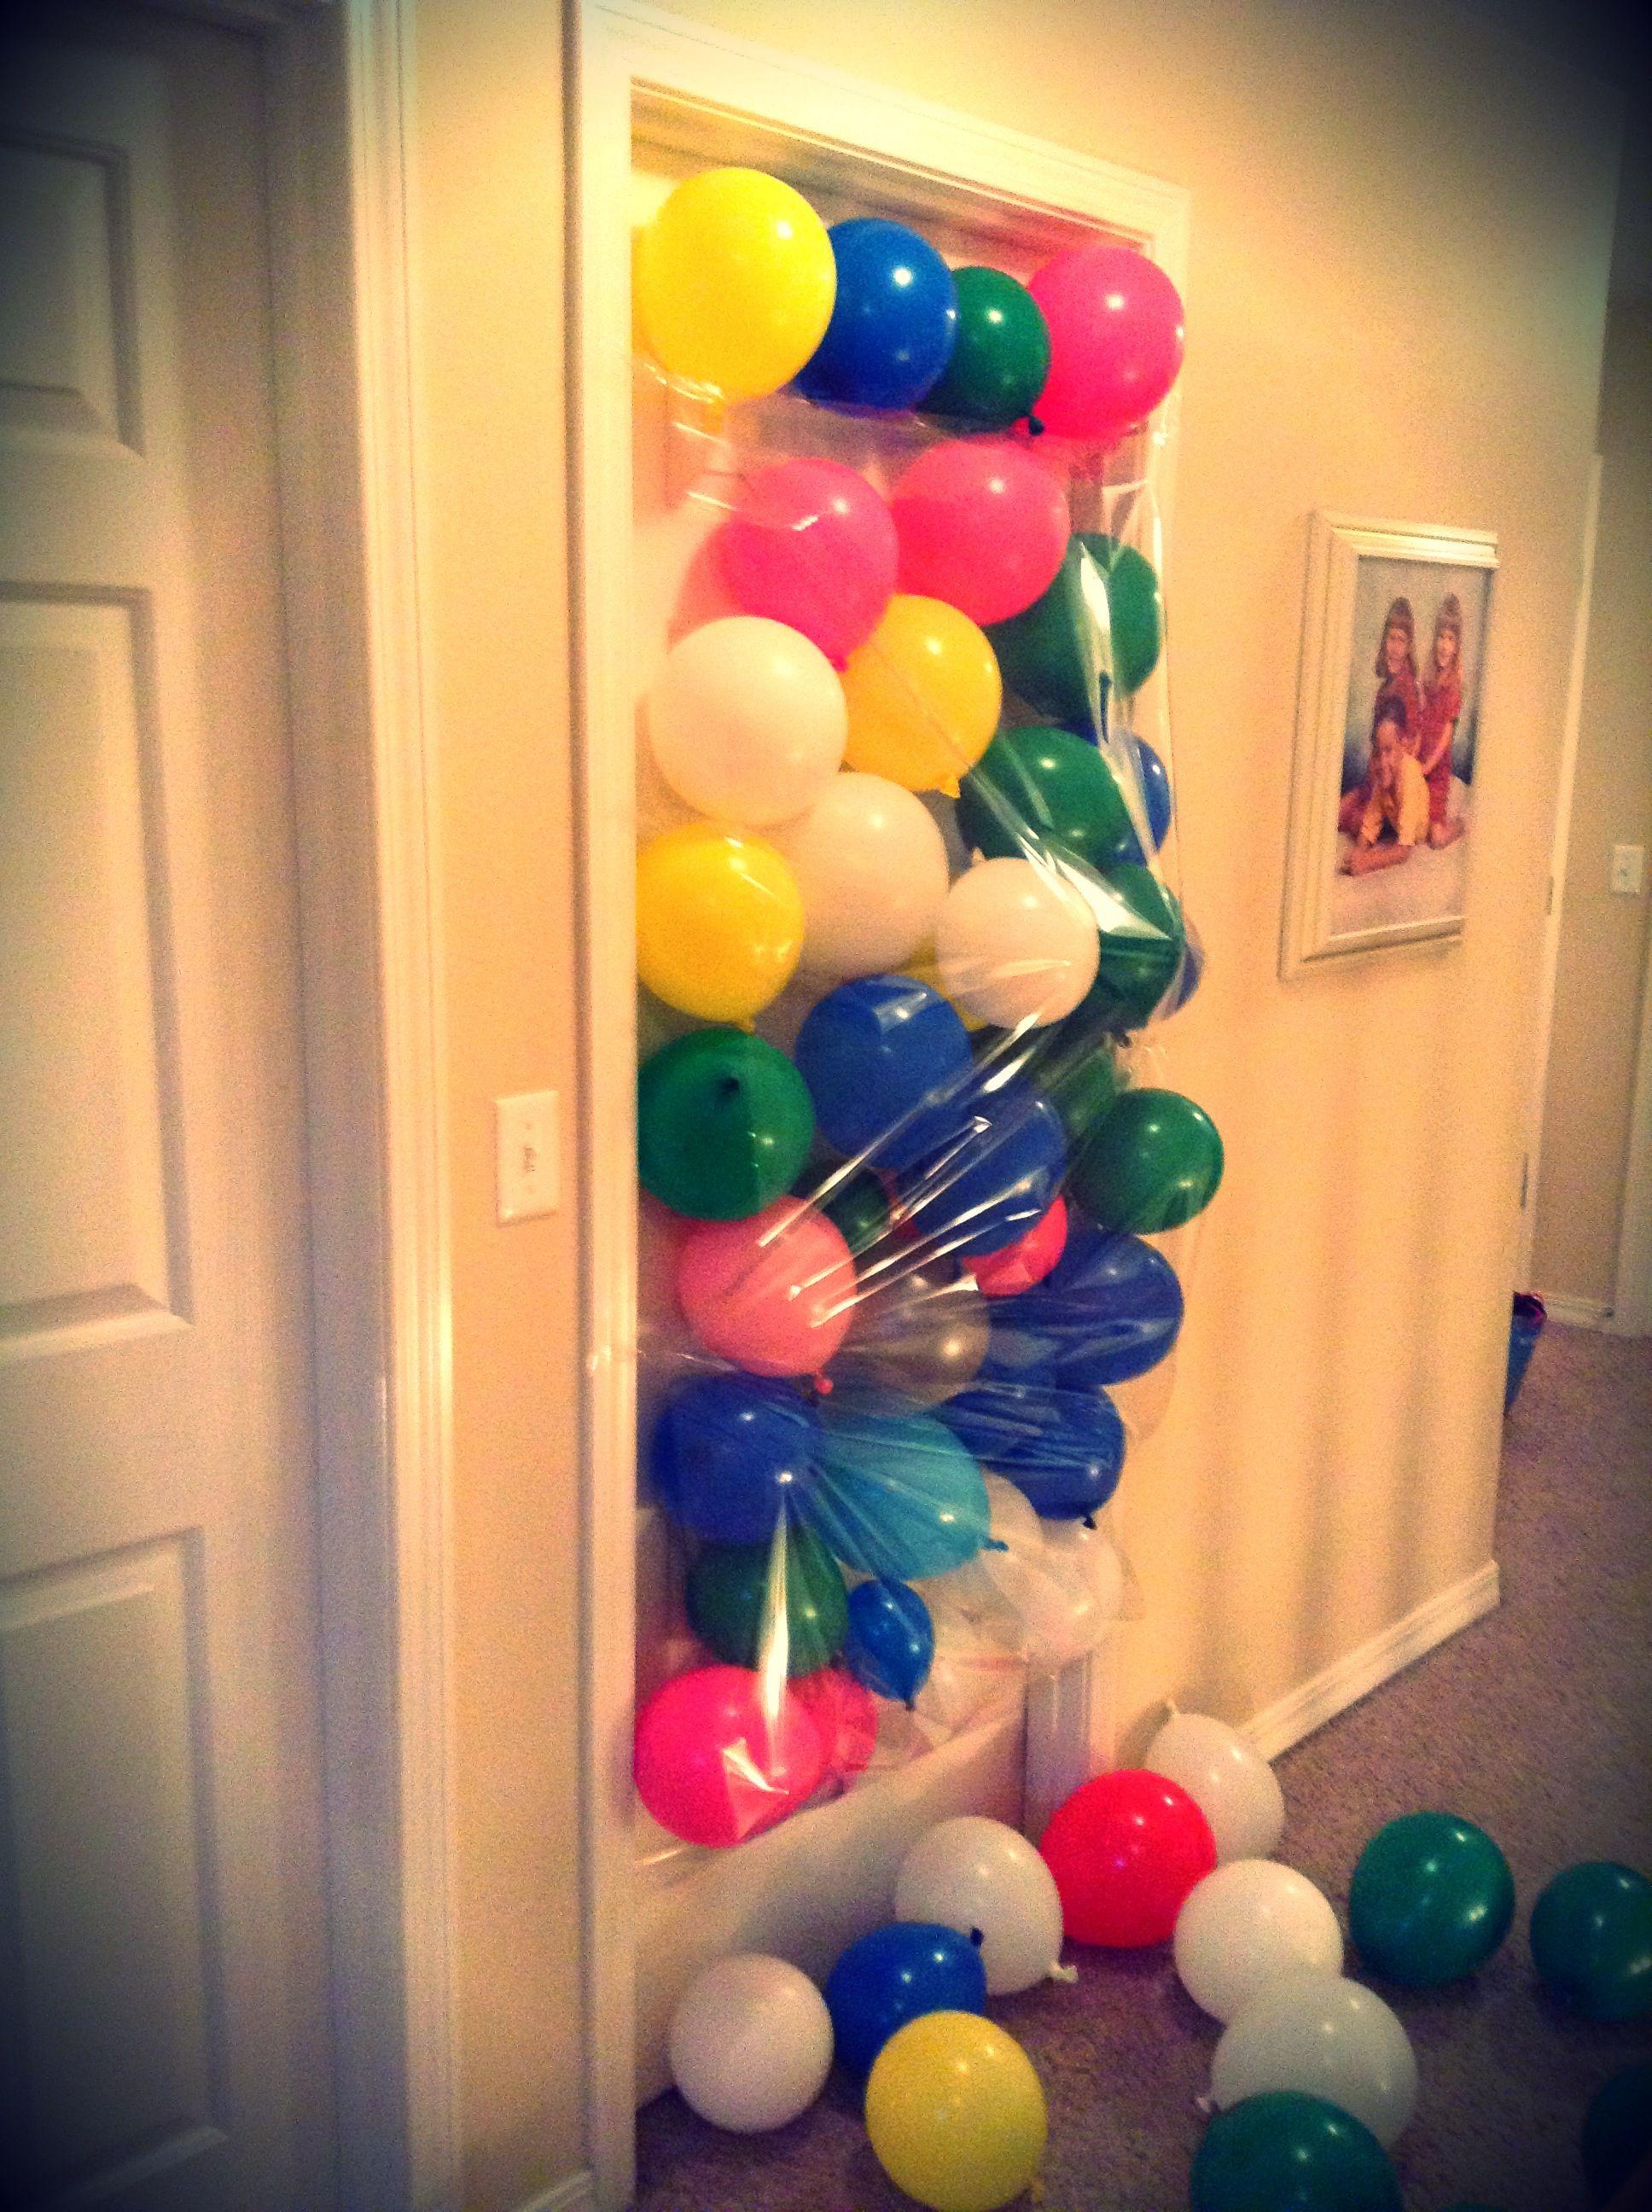 Balloon Birthday Surprise!:) Maddie Will LOVE This! (I